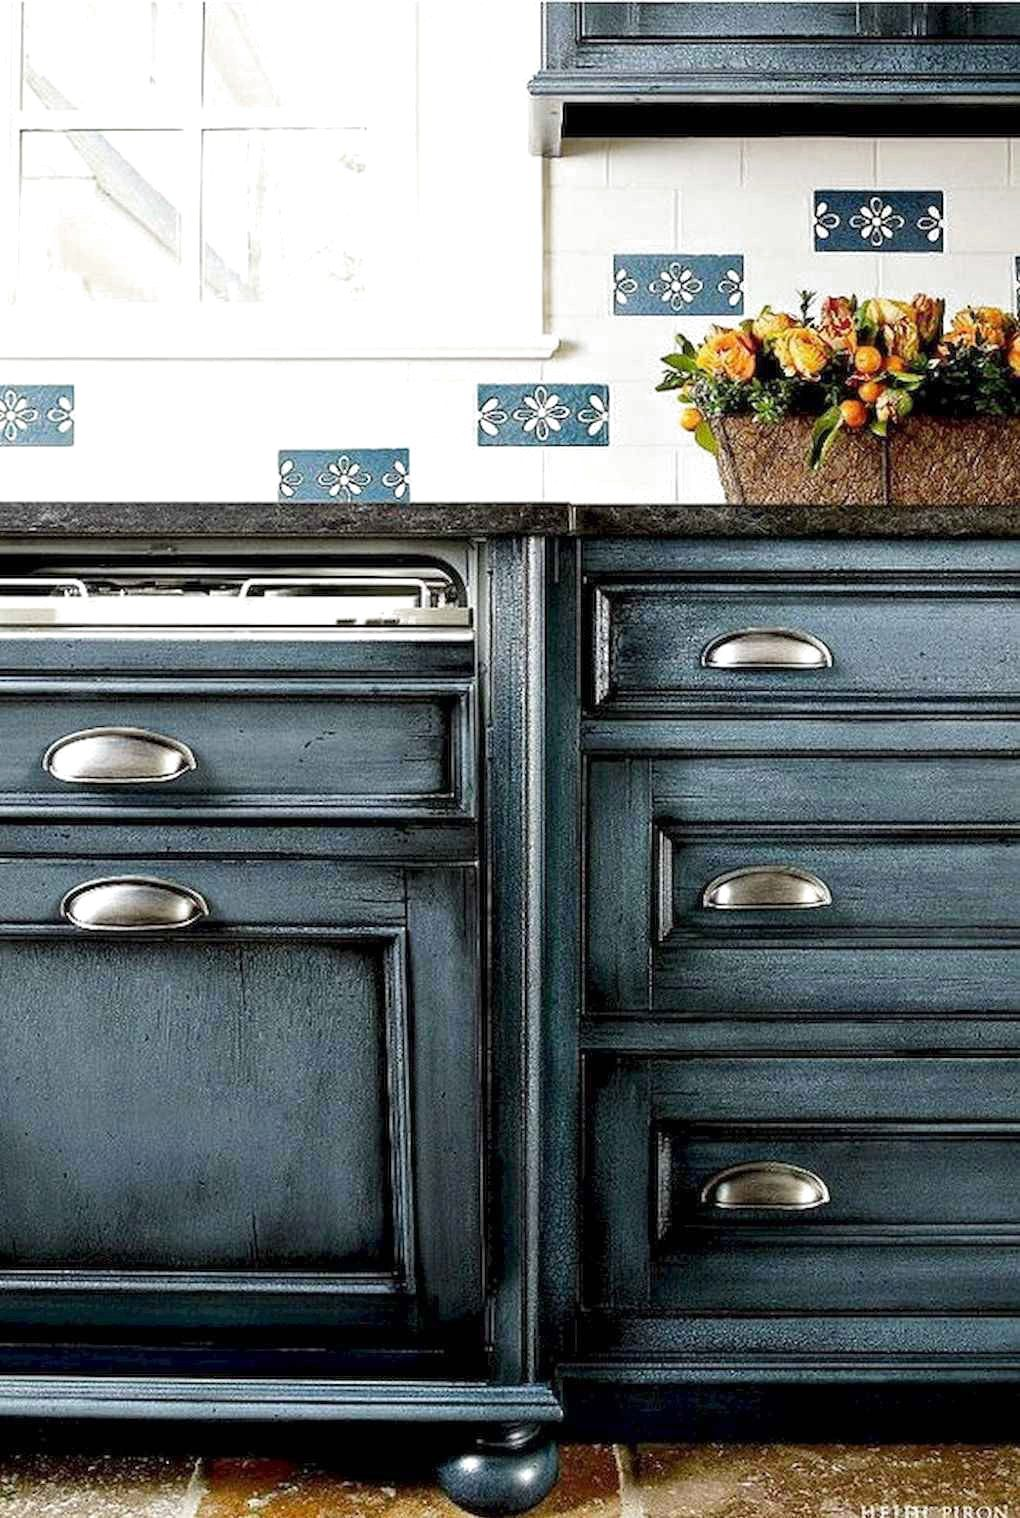 Favorite Farmhouse Kitchen Cabinet Design Ideas Exp Decor In 2020 Painted Kitchen Cabinets Colors Navy Kitchen Cabinets Blue Kitchen Cabinets